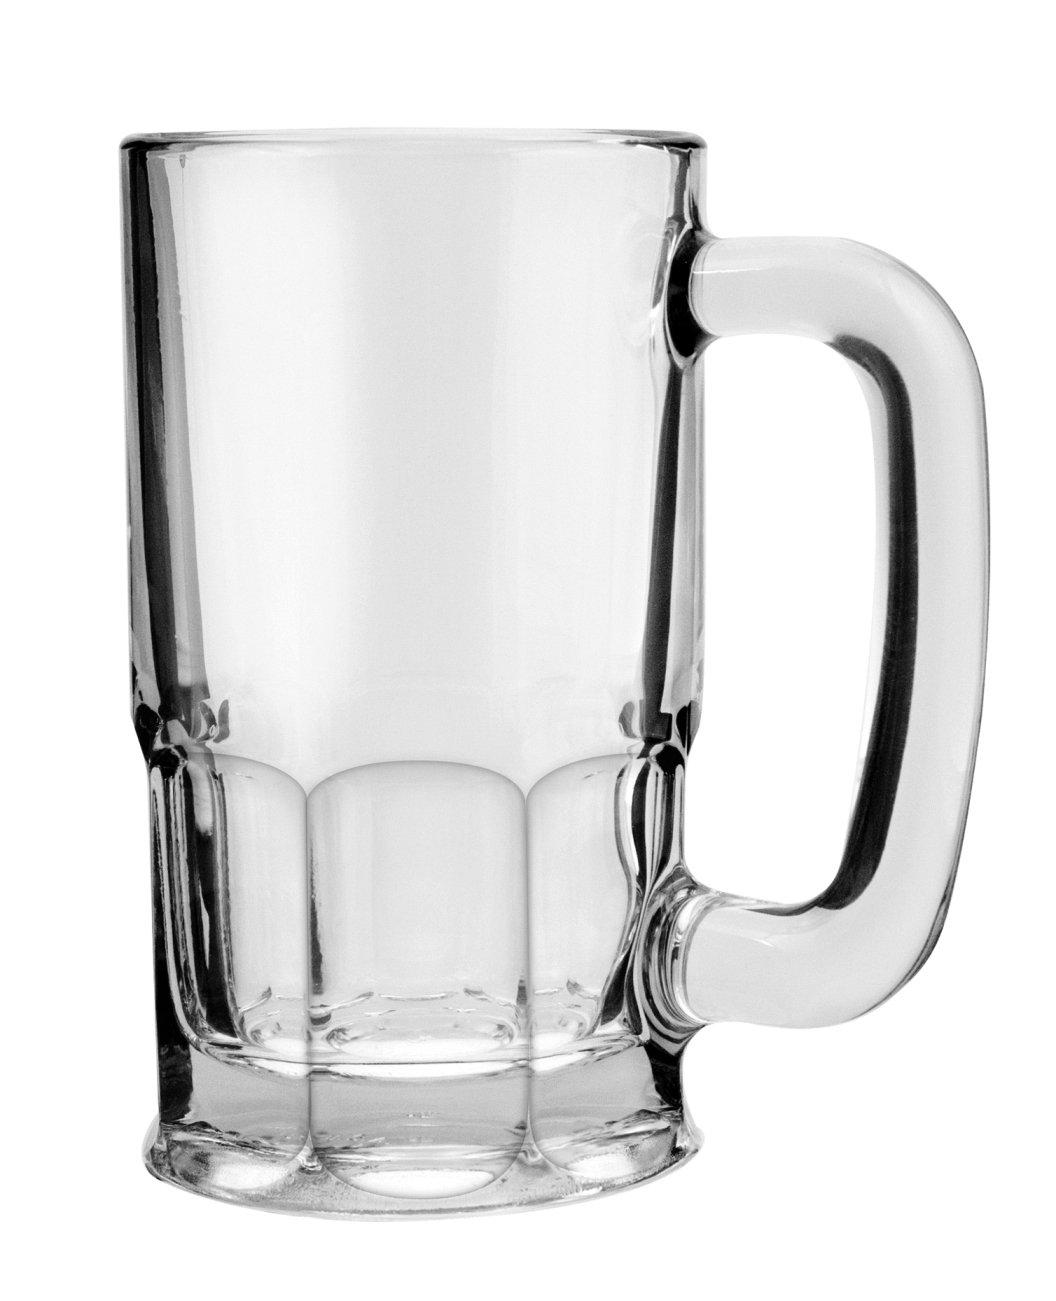 Anchor Hocking Wagon Glass Beer Mugs, 20 oz (set of 6)